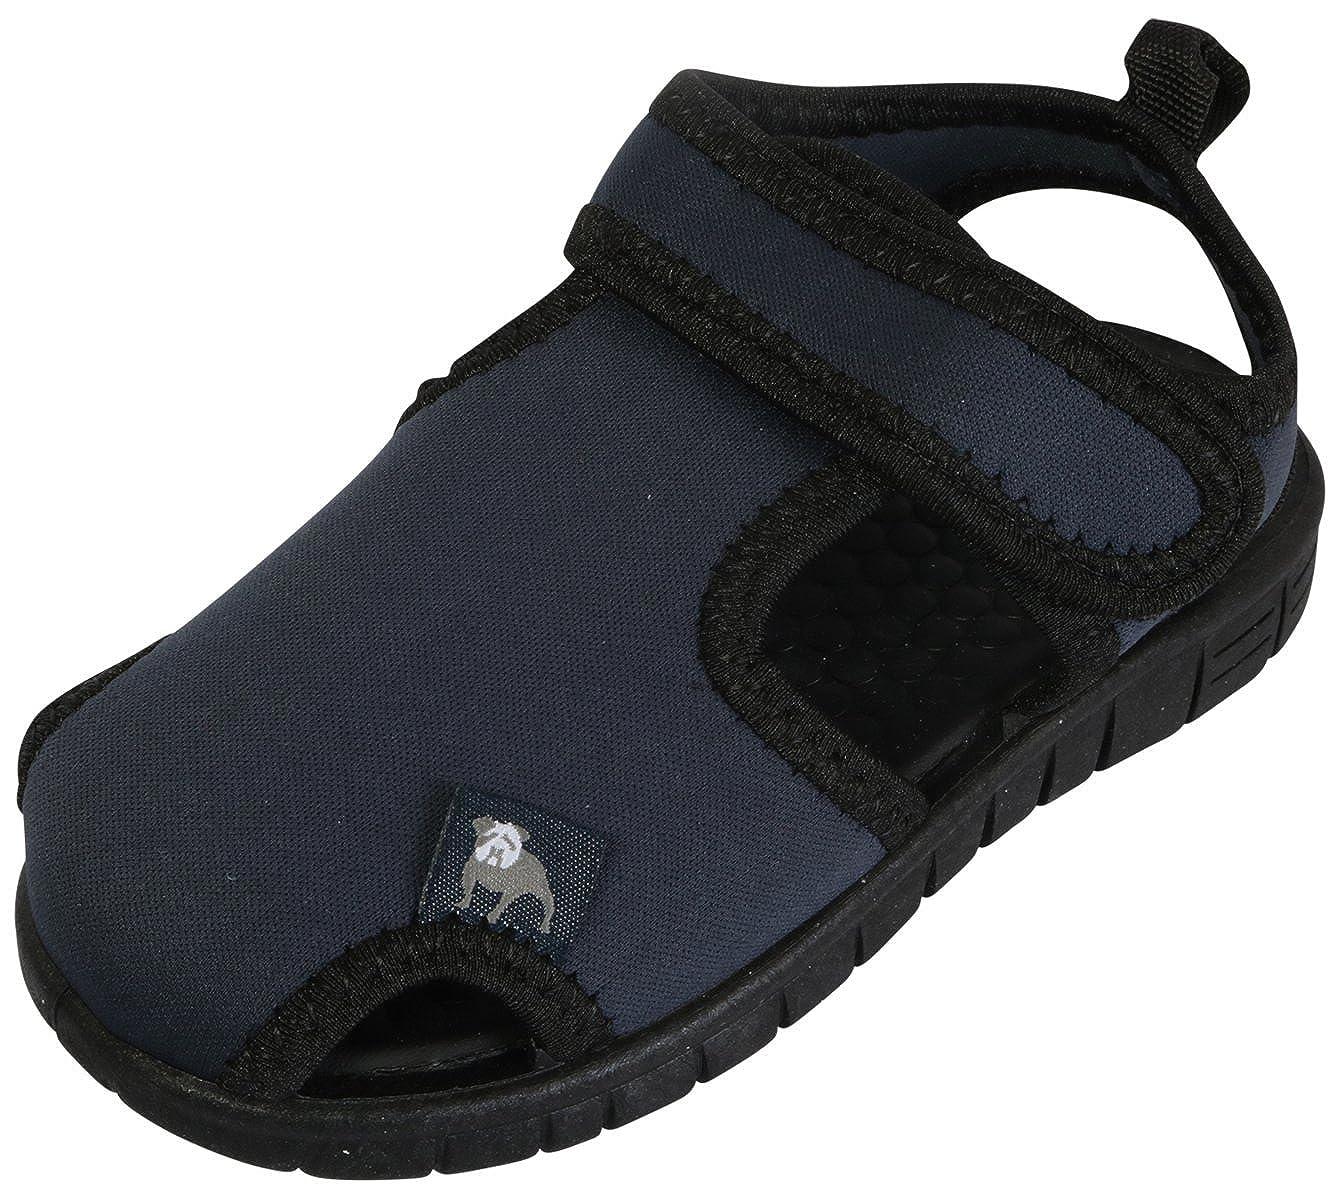 B.U.M. Equipment Boys Water Shoes (Infant, Toddler)